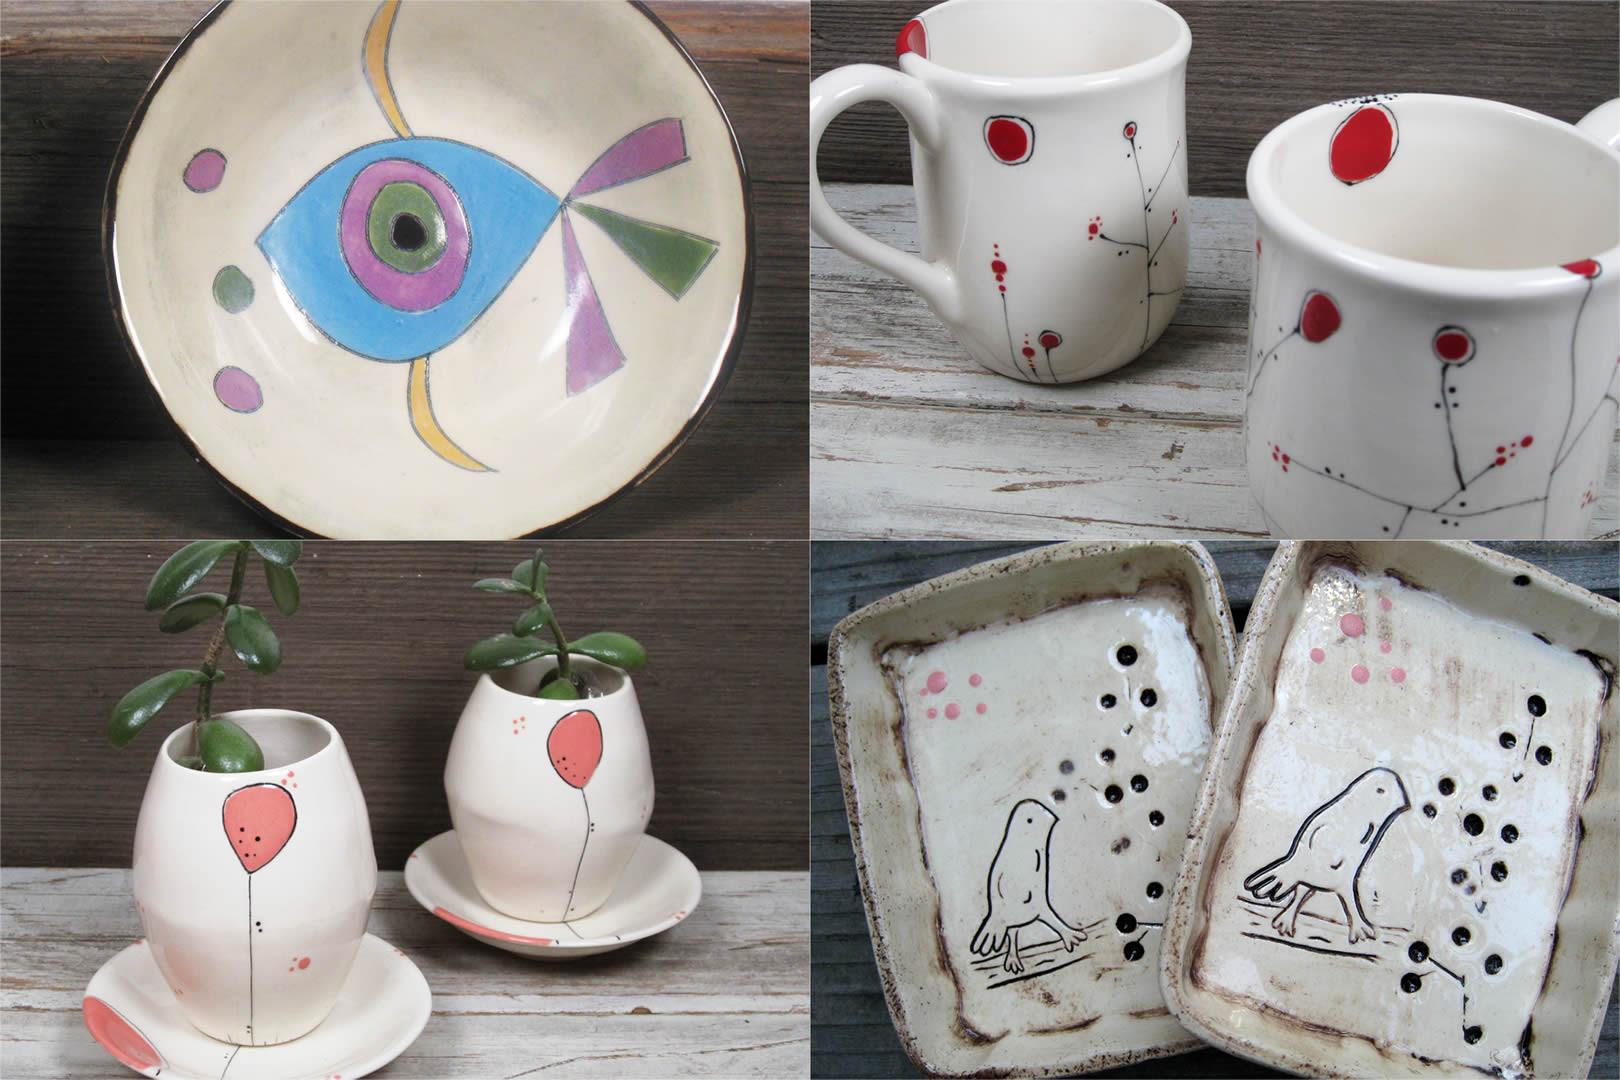 Leslie Ceramic Supply Co Inc Blog More On Chanda Beck